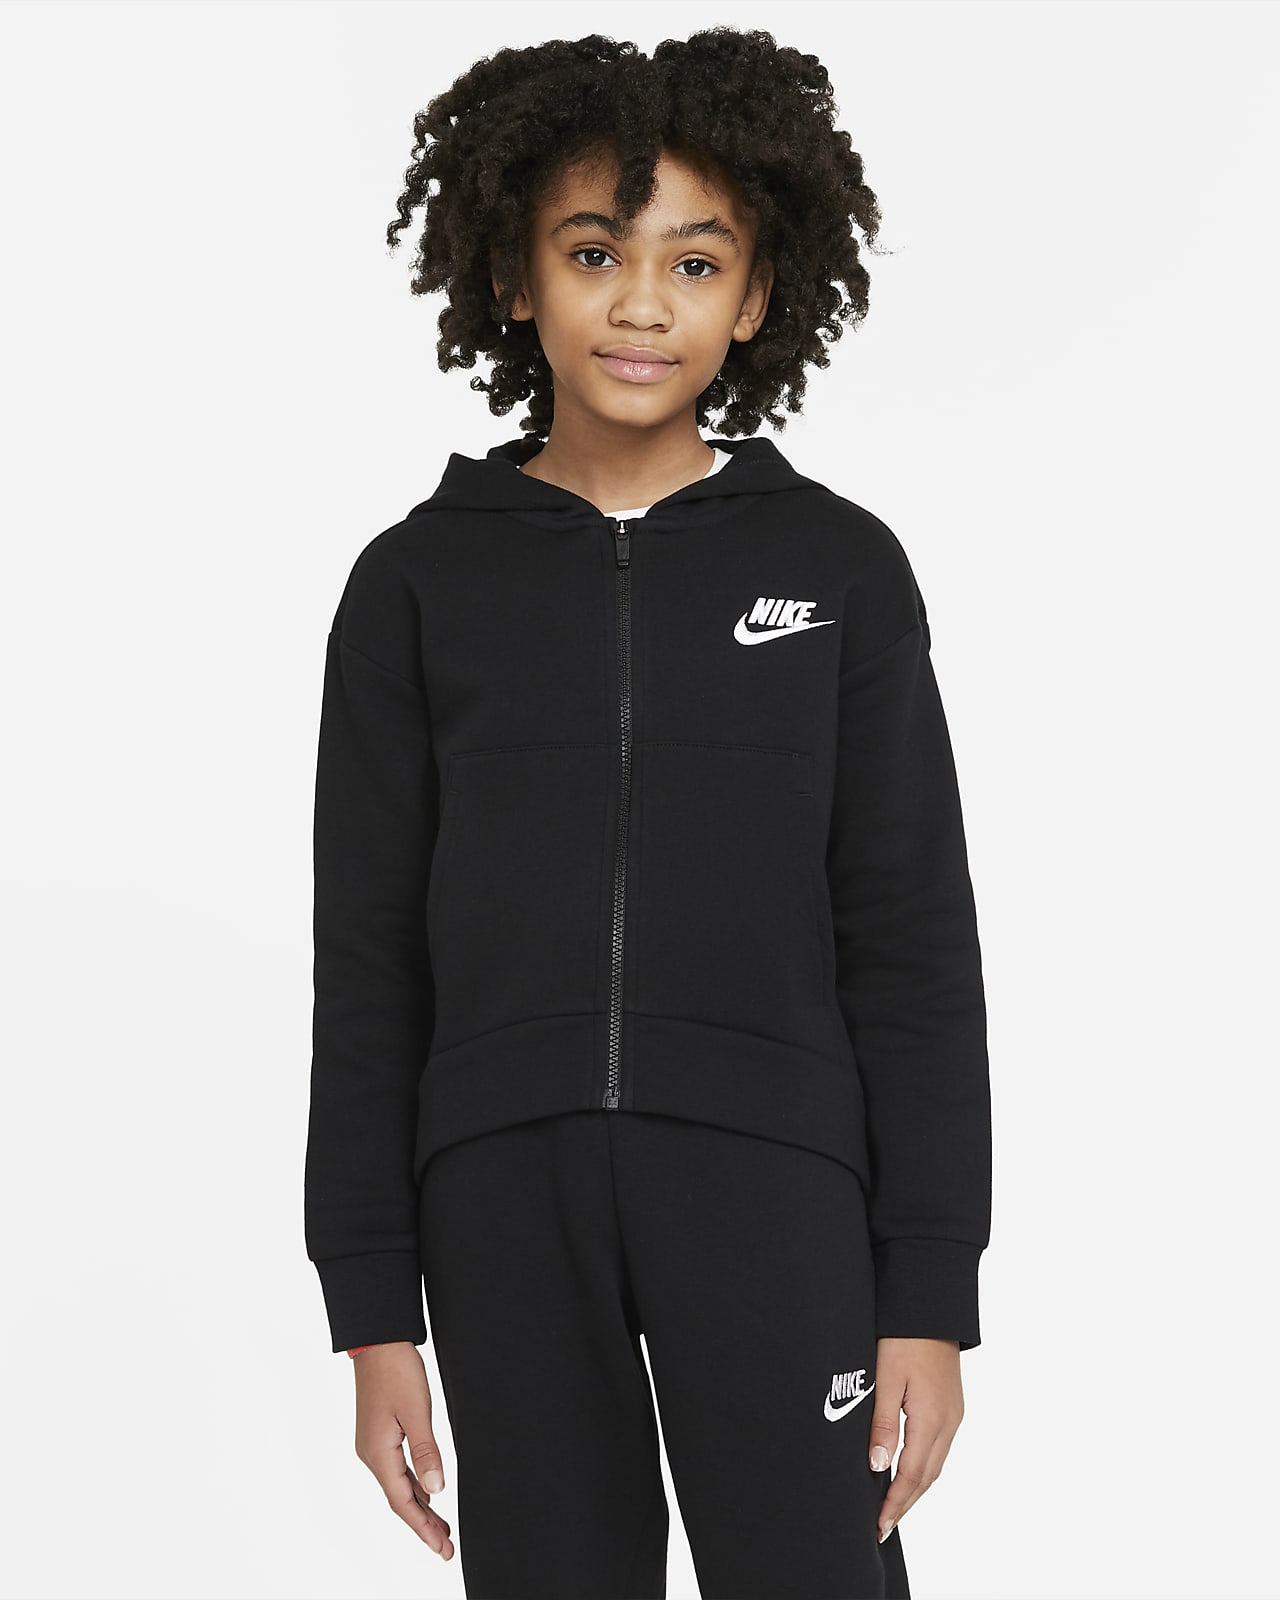 Hoodie com fecho completo Nike Sportswear Club Fleece Júnior (Rapariga)